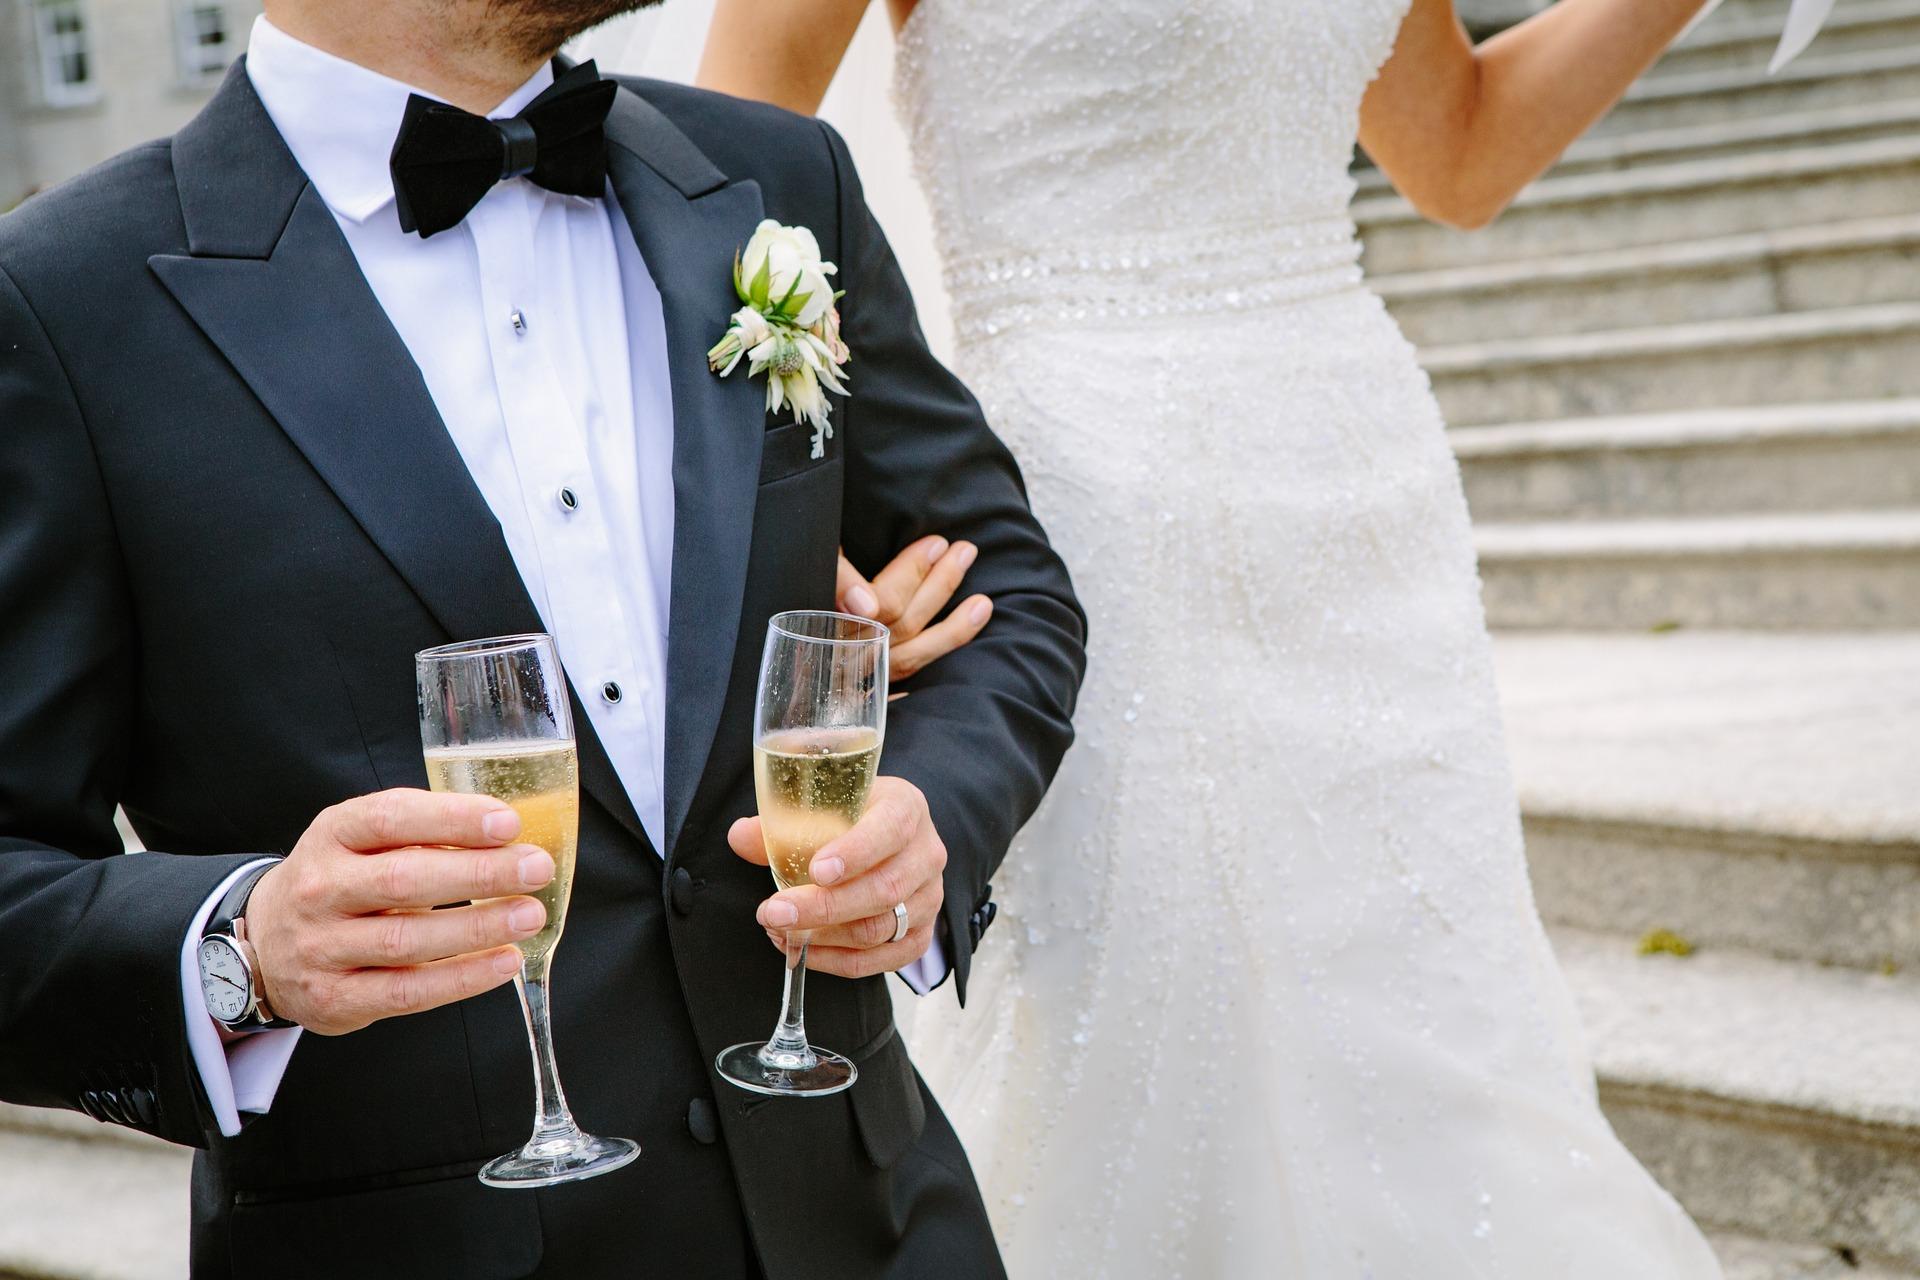 Права и обязательства супругов